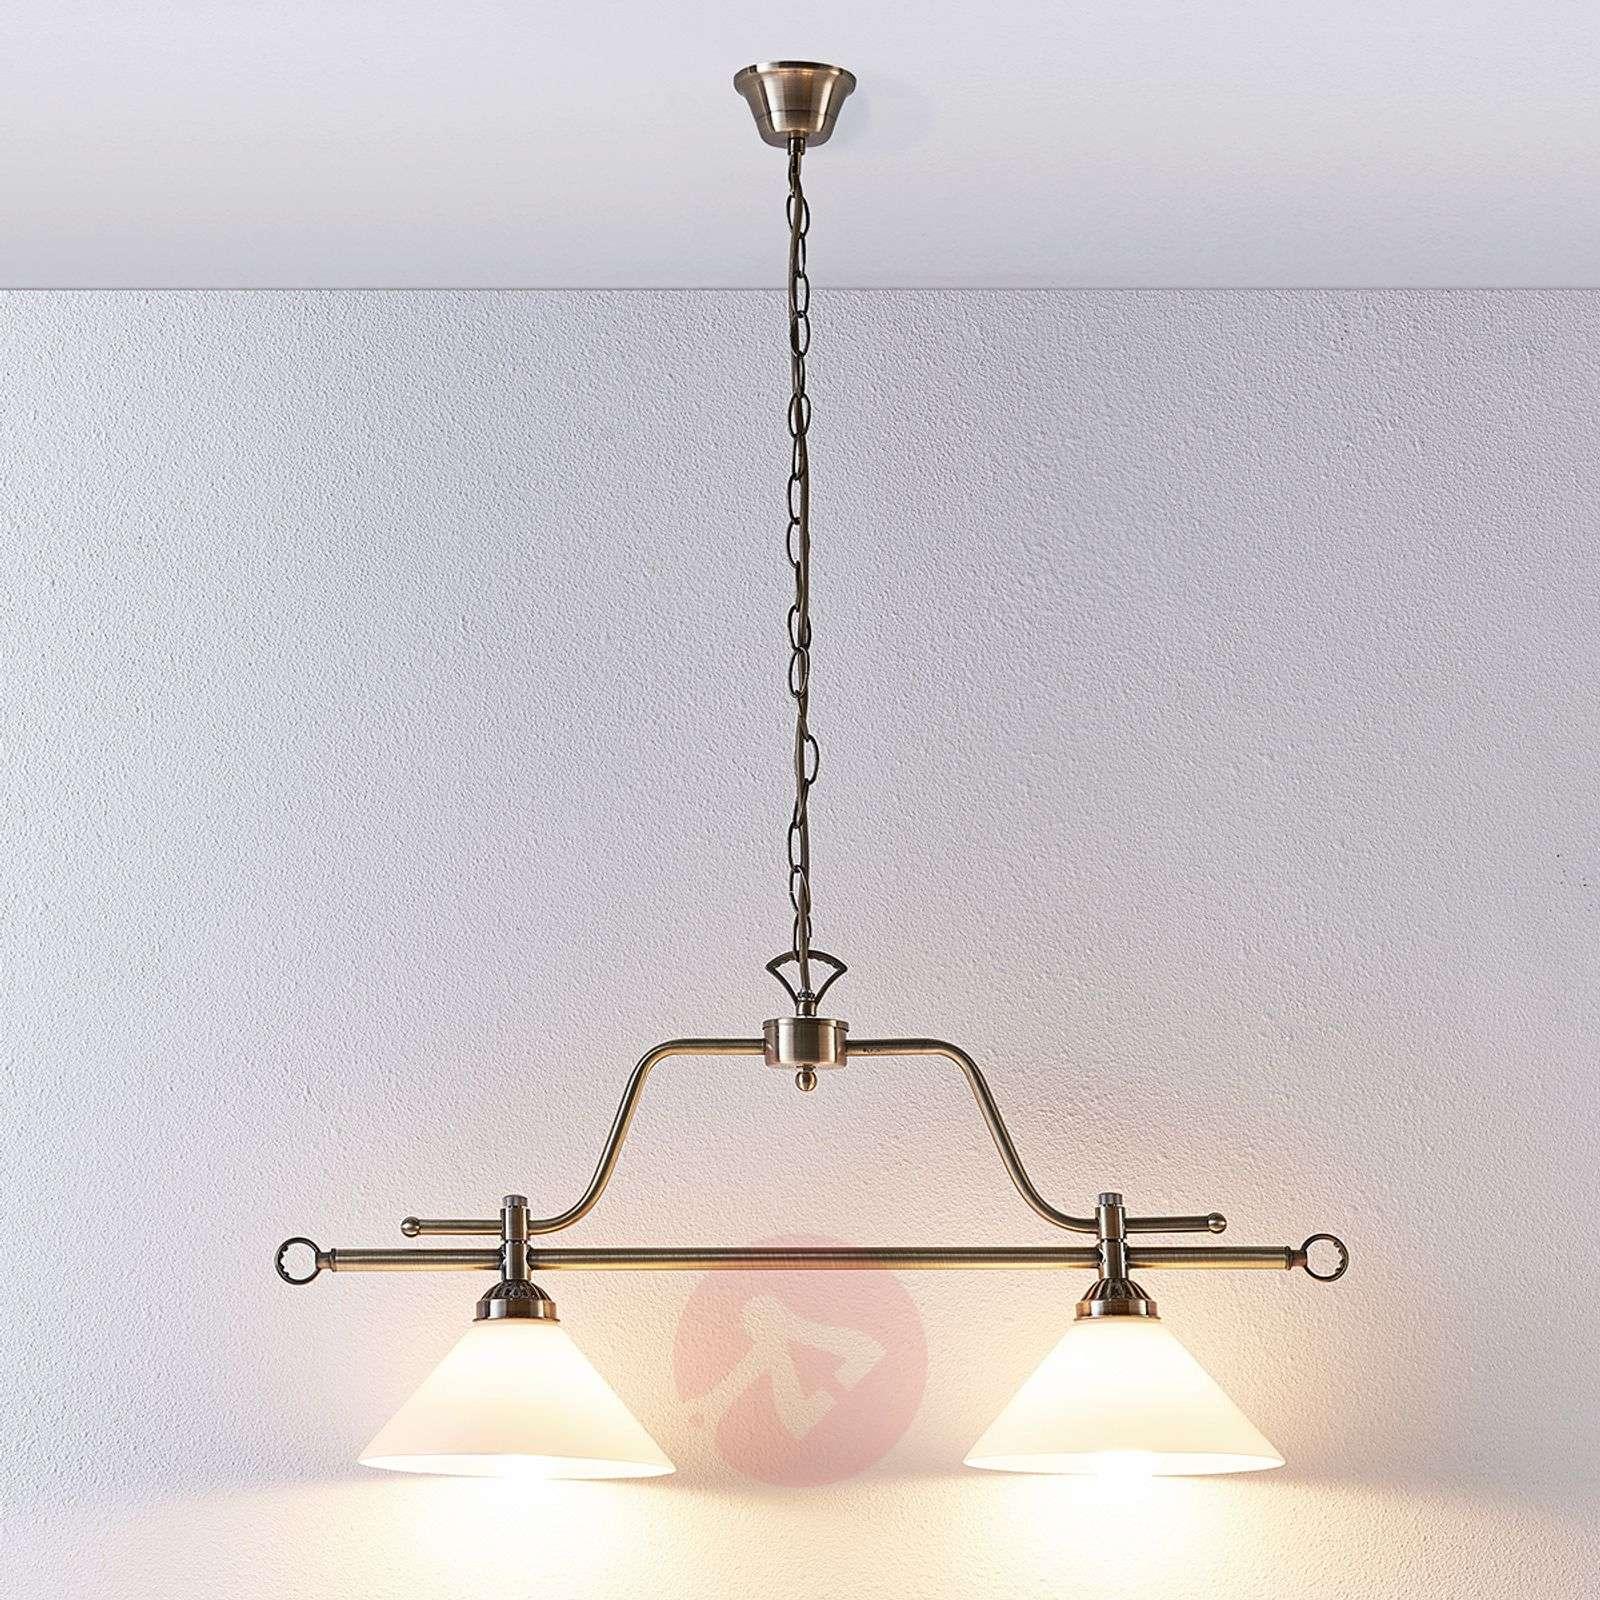 Dining table hanging lamp Otis, 2-bulb-9621032-03